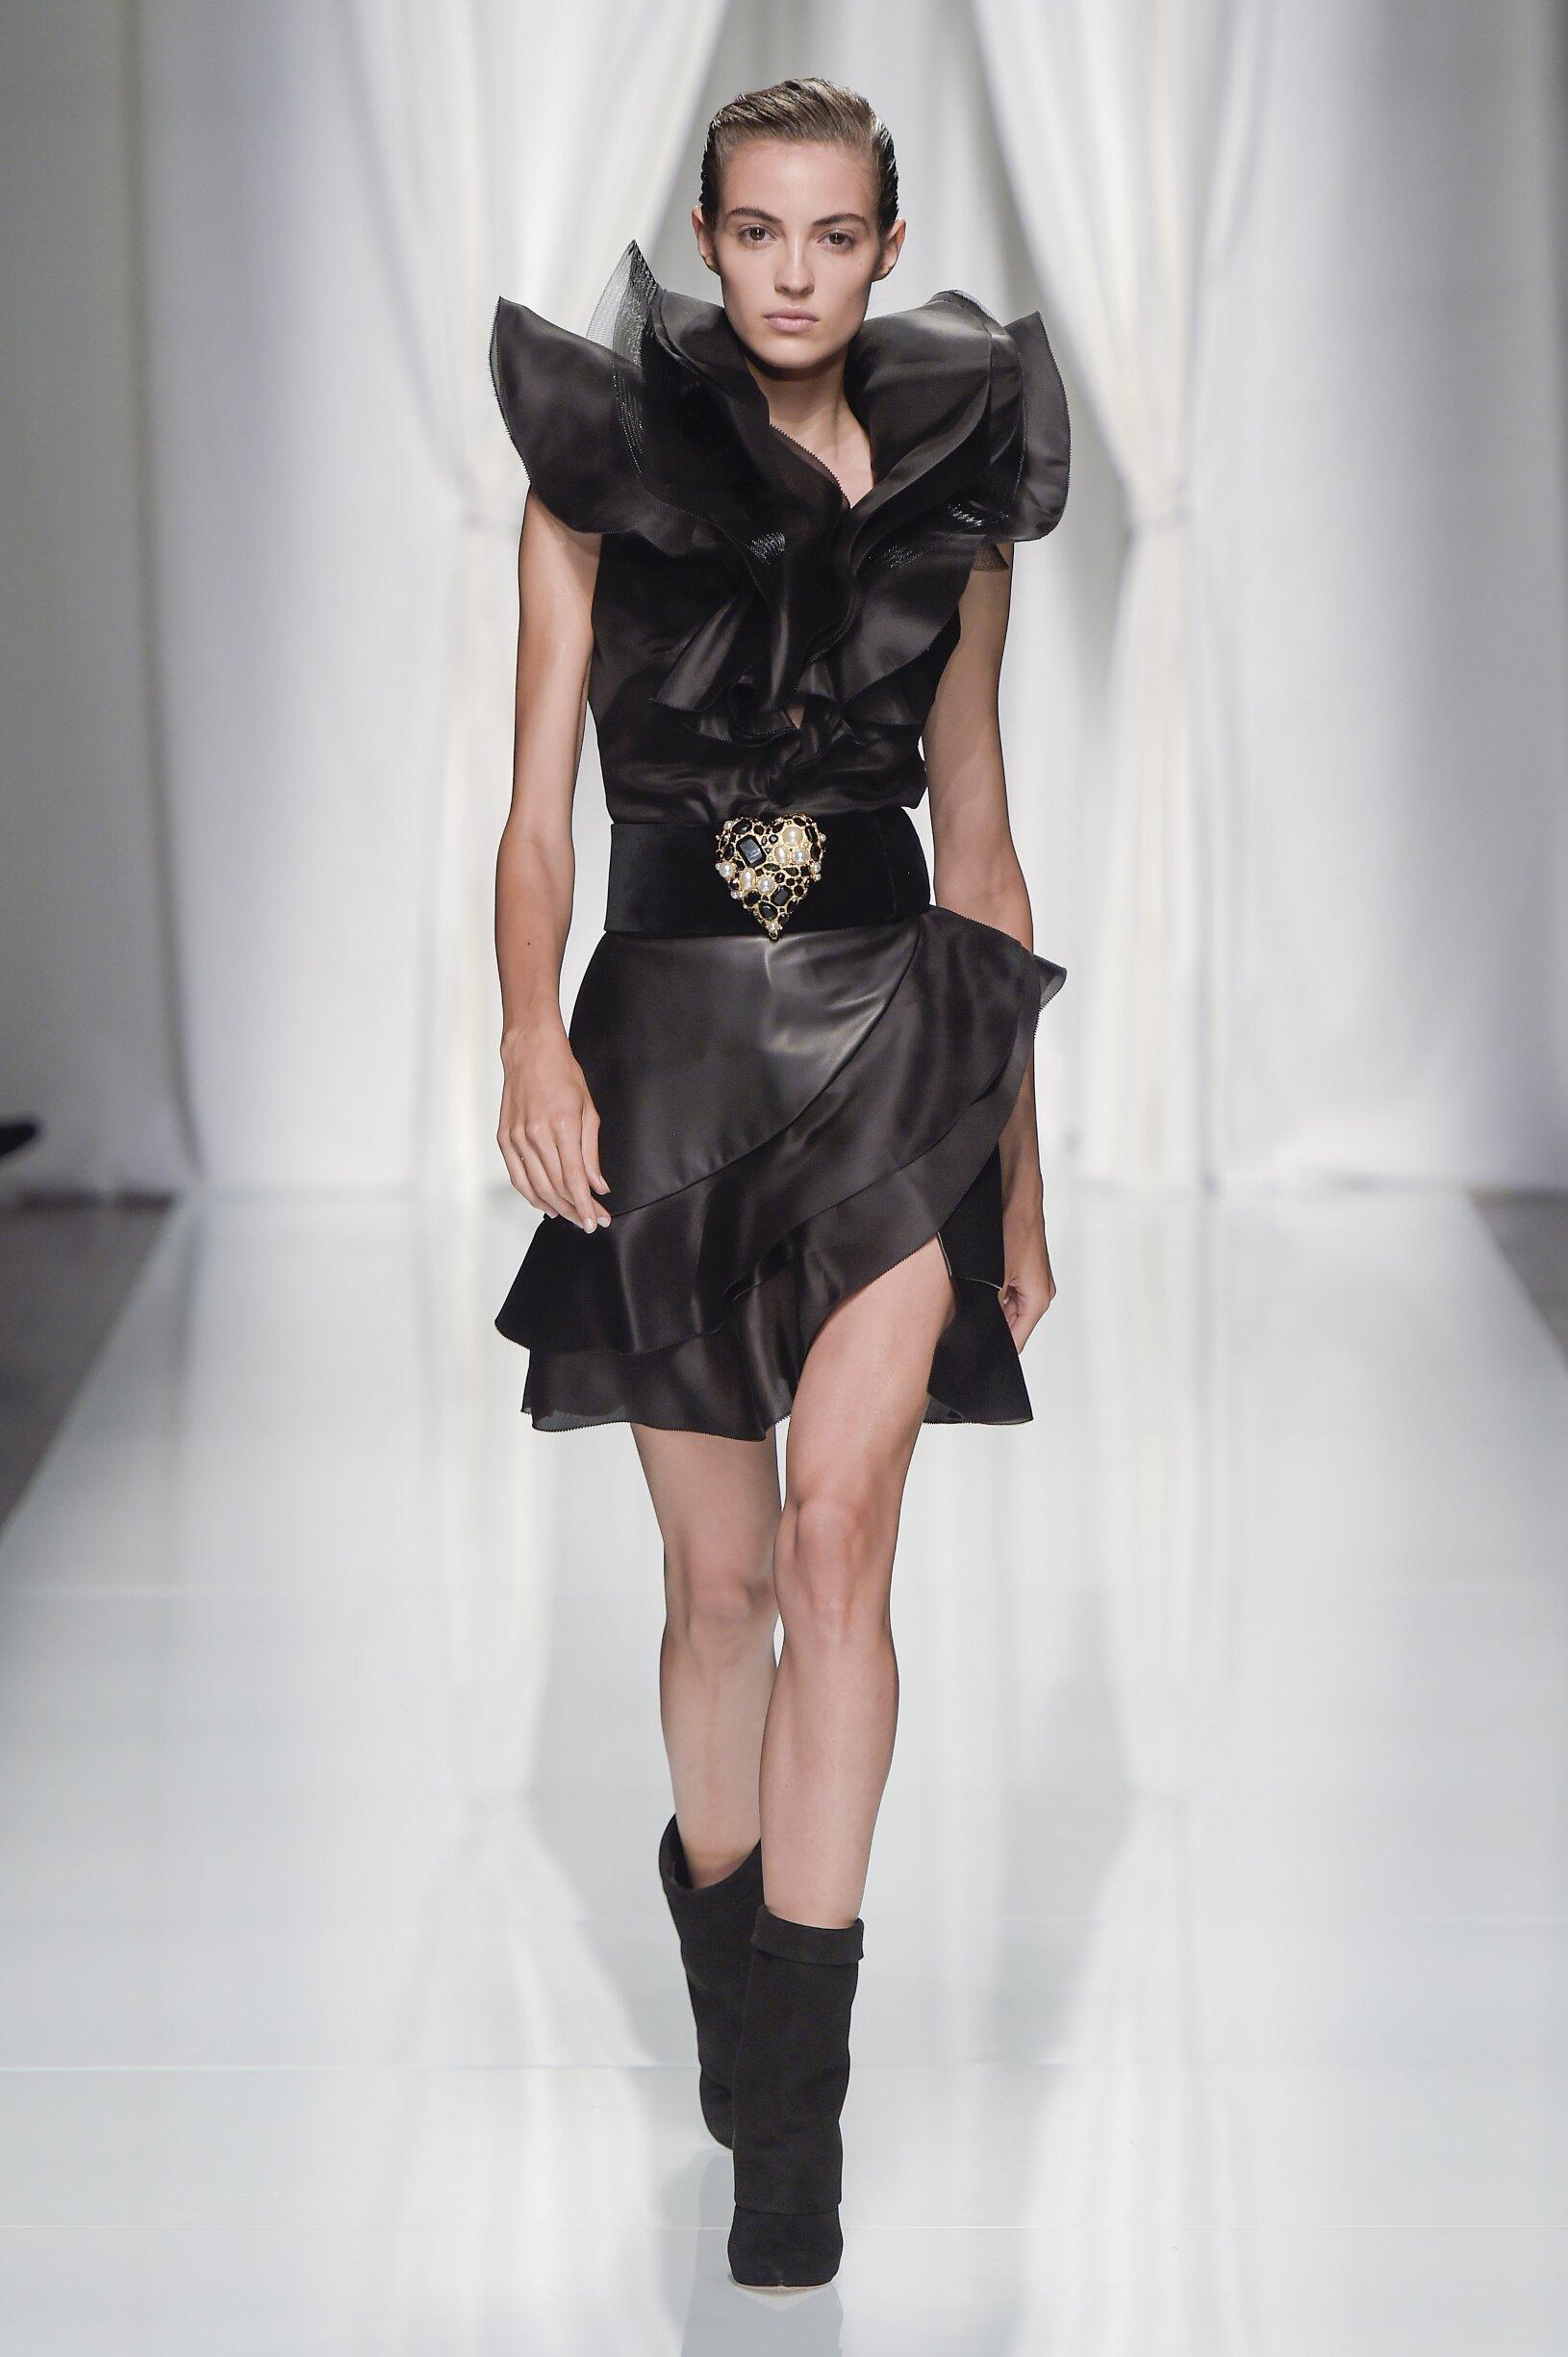 Emanuel Ungaro Fashion Show SS 2017